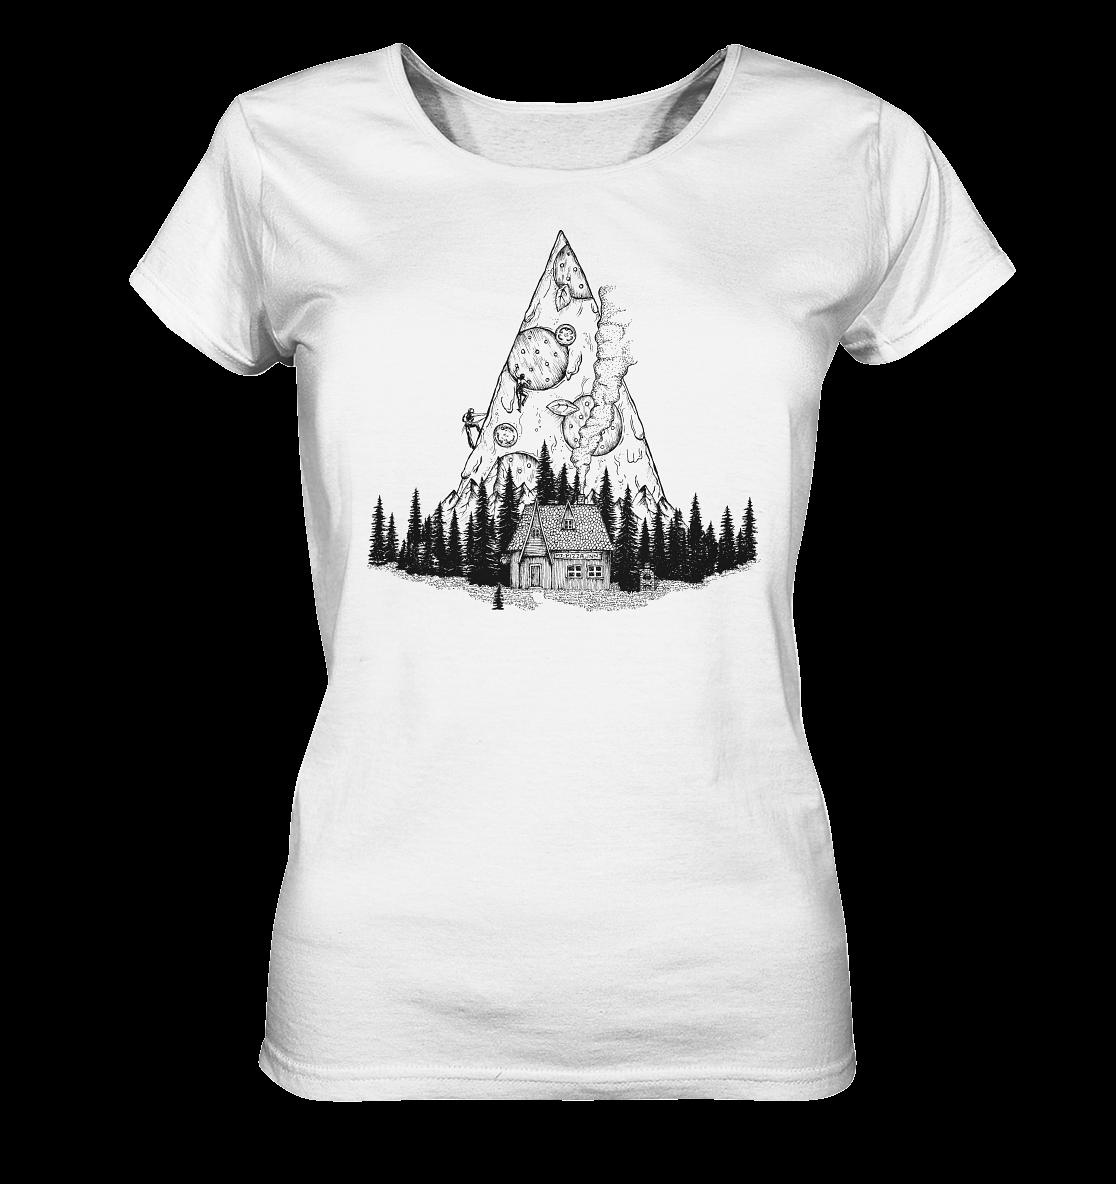 front-ladies-organic-shirt-f8f8f8-1116x-6.png